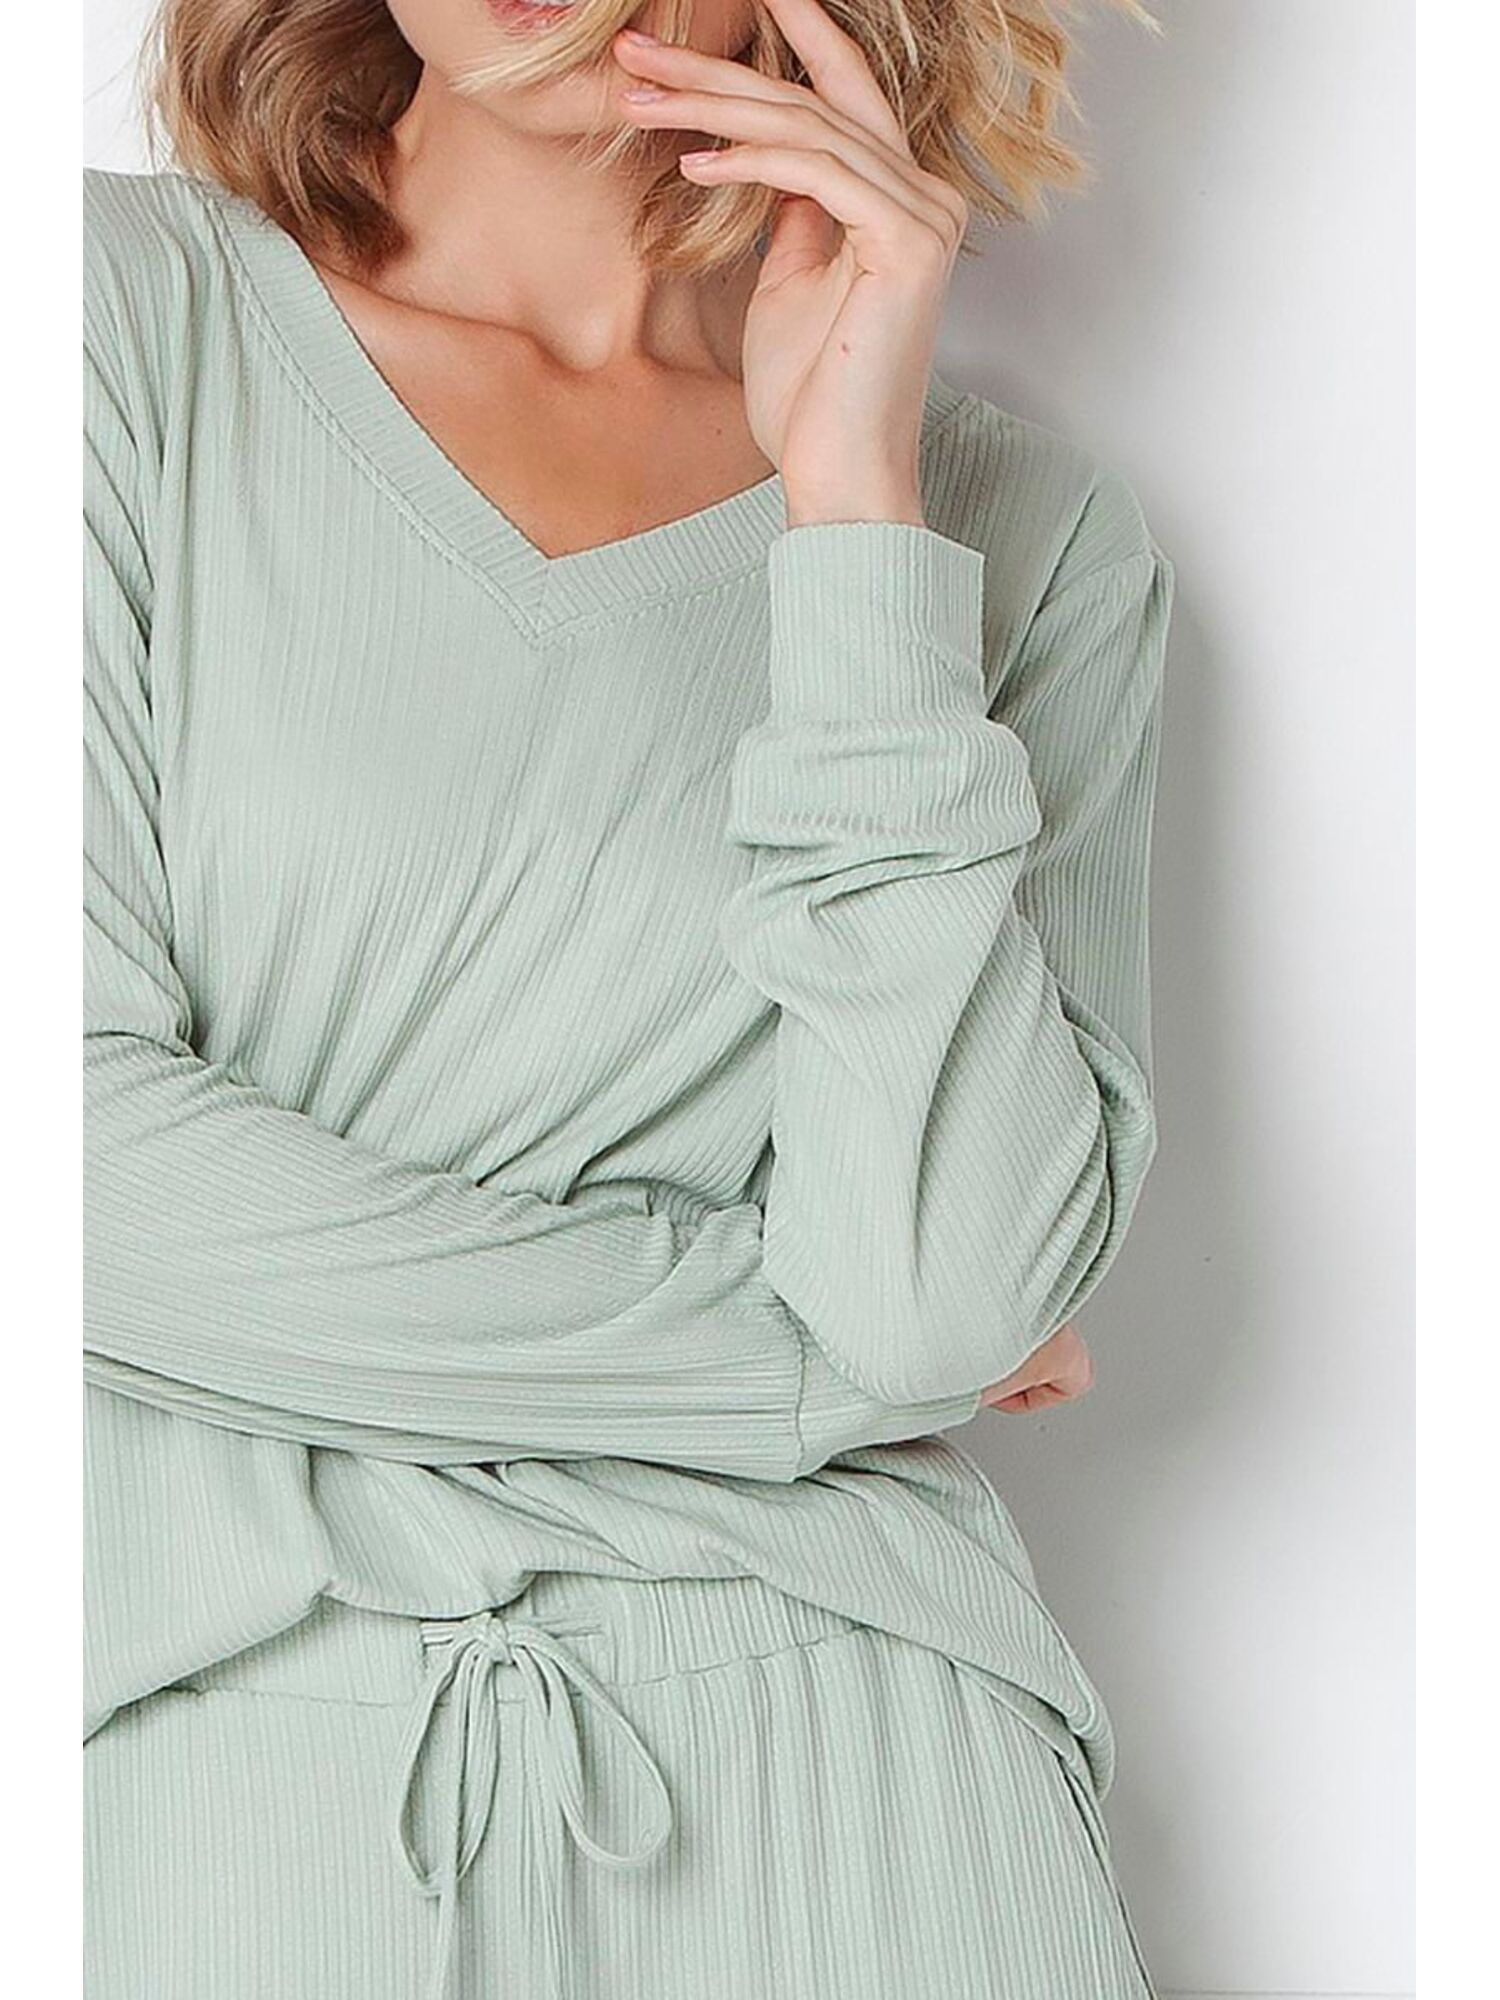 Комплект женский со штанами TINA FOREST GREEN, зеленый, ARUELLE